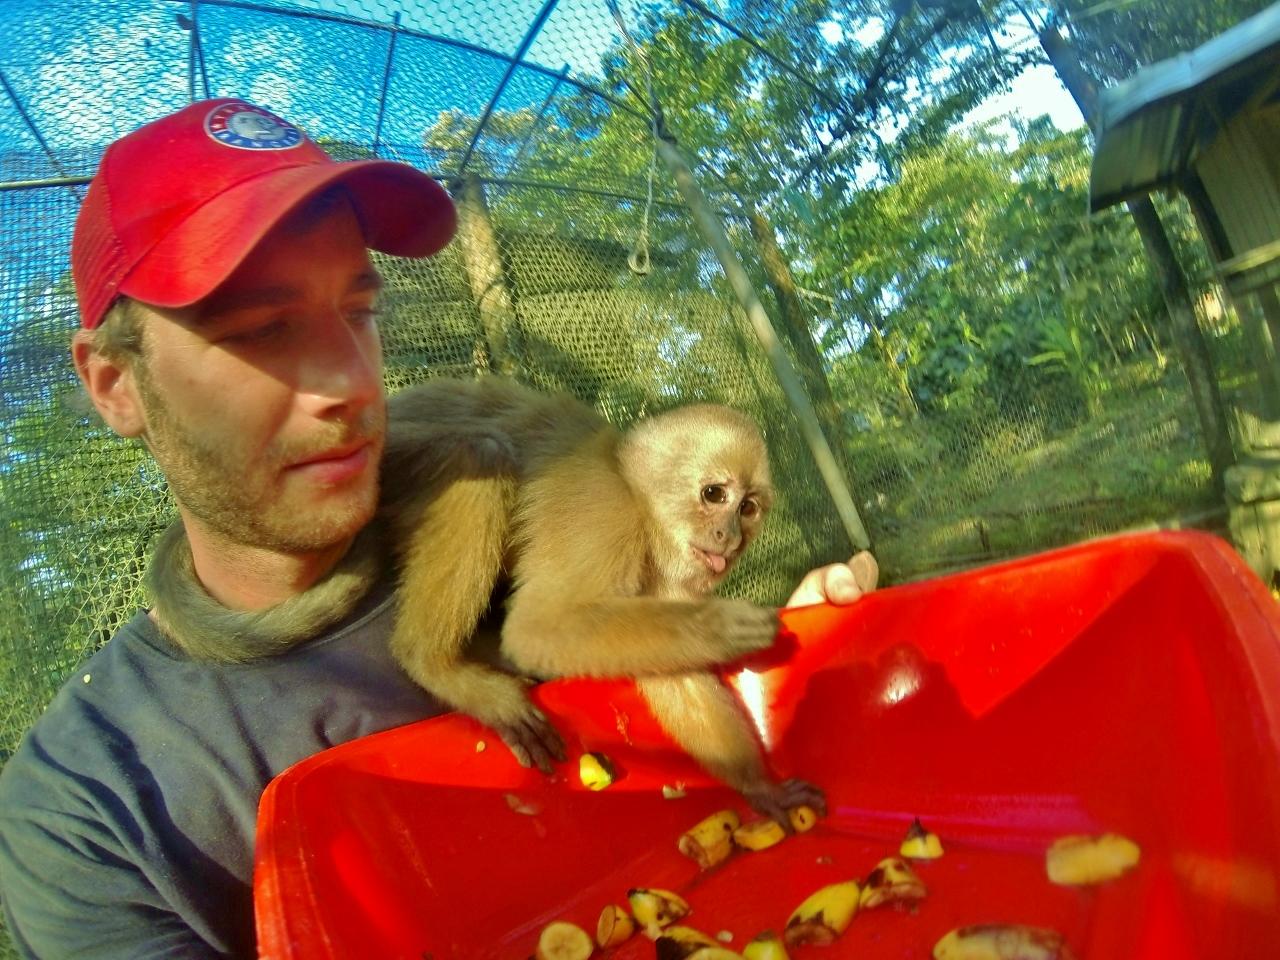 Bros 4 lyfe (with Ricky the capuchin monkey)